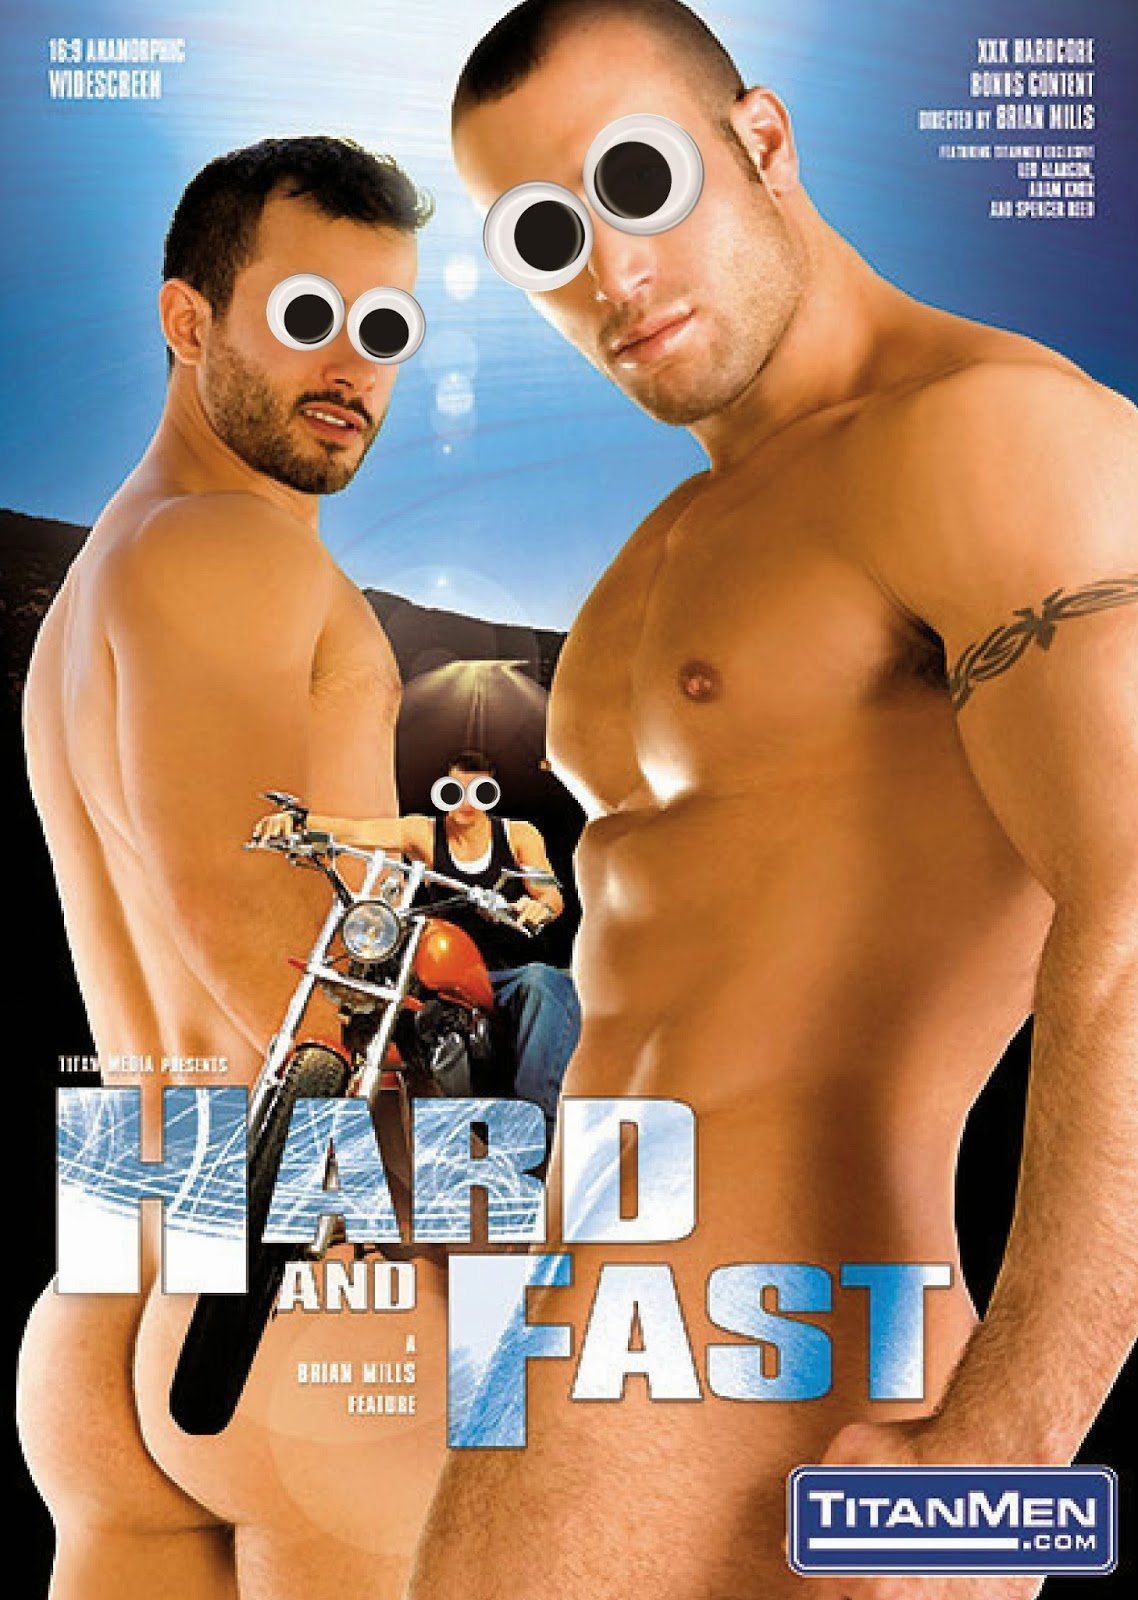 Gay porn movie titles